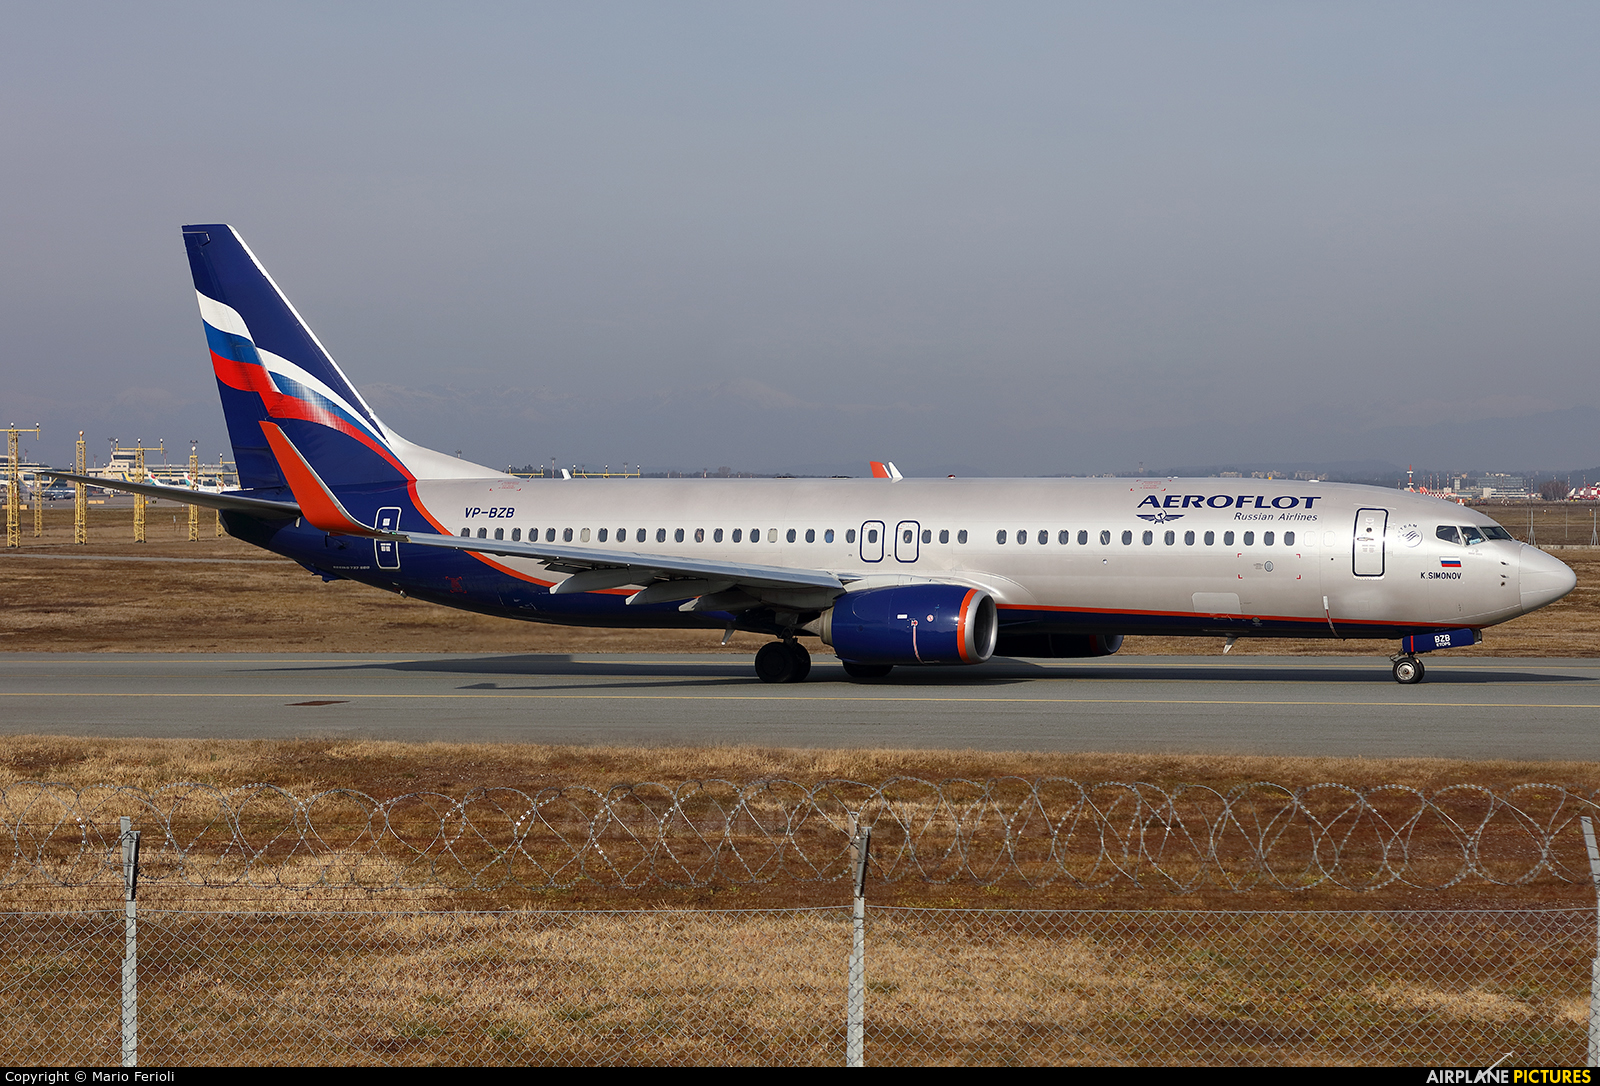 Aeroflot VP-BZB aircraft at Milan - Malpensa